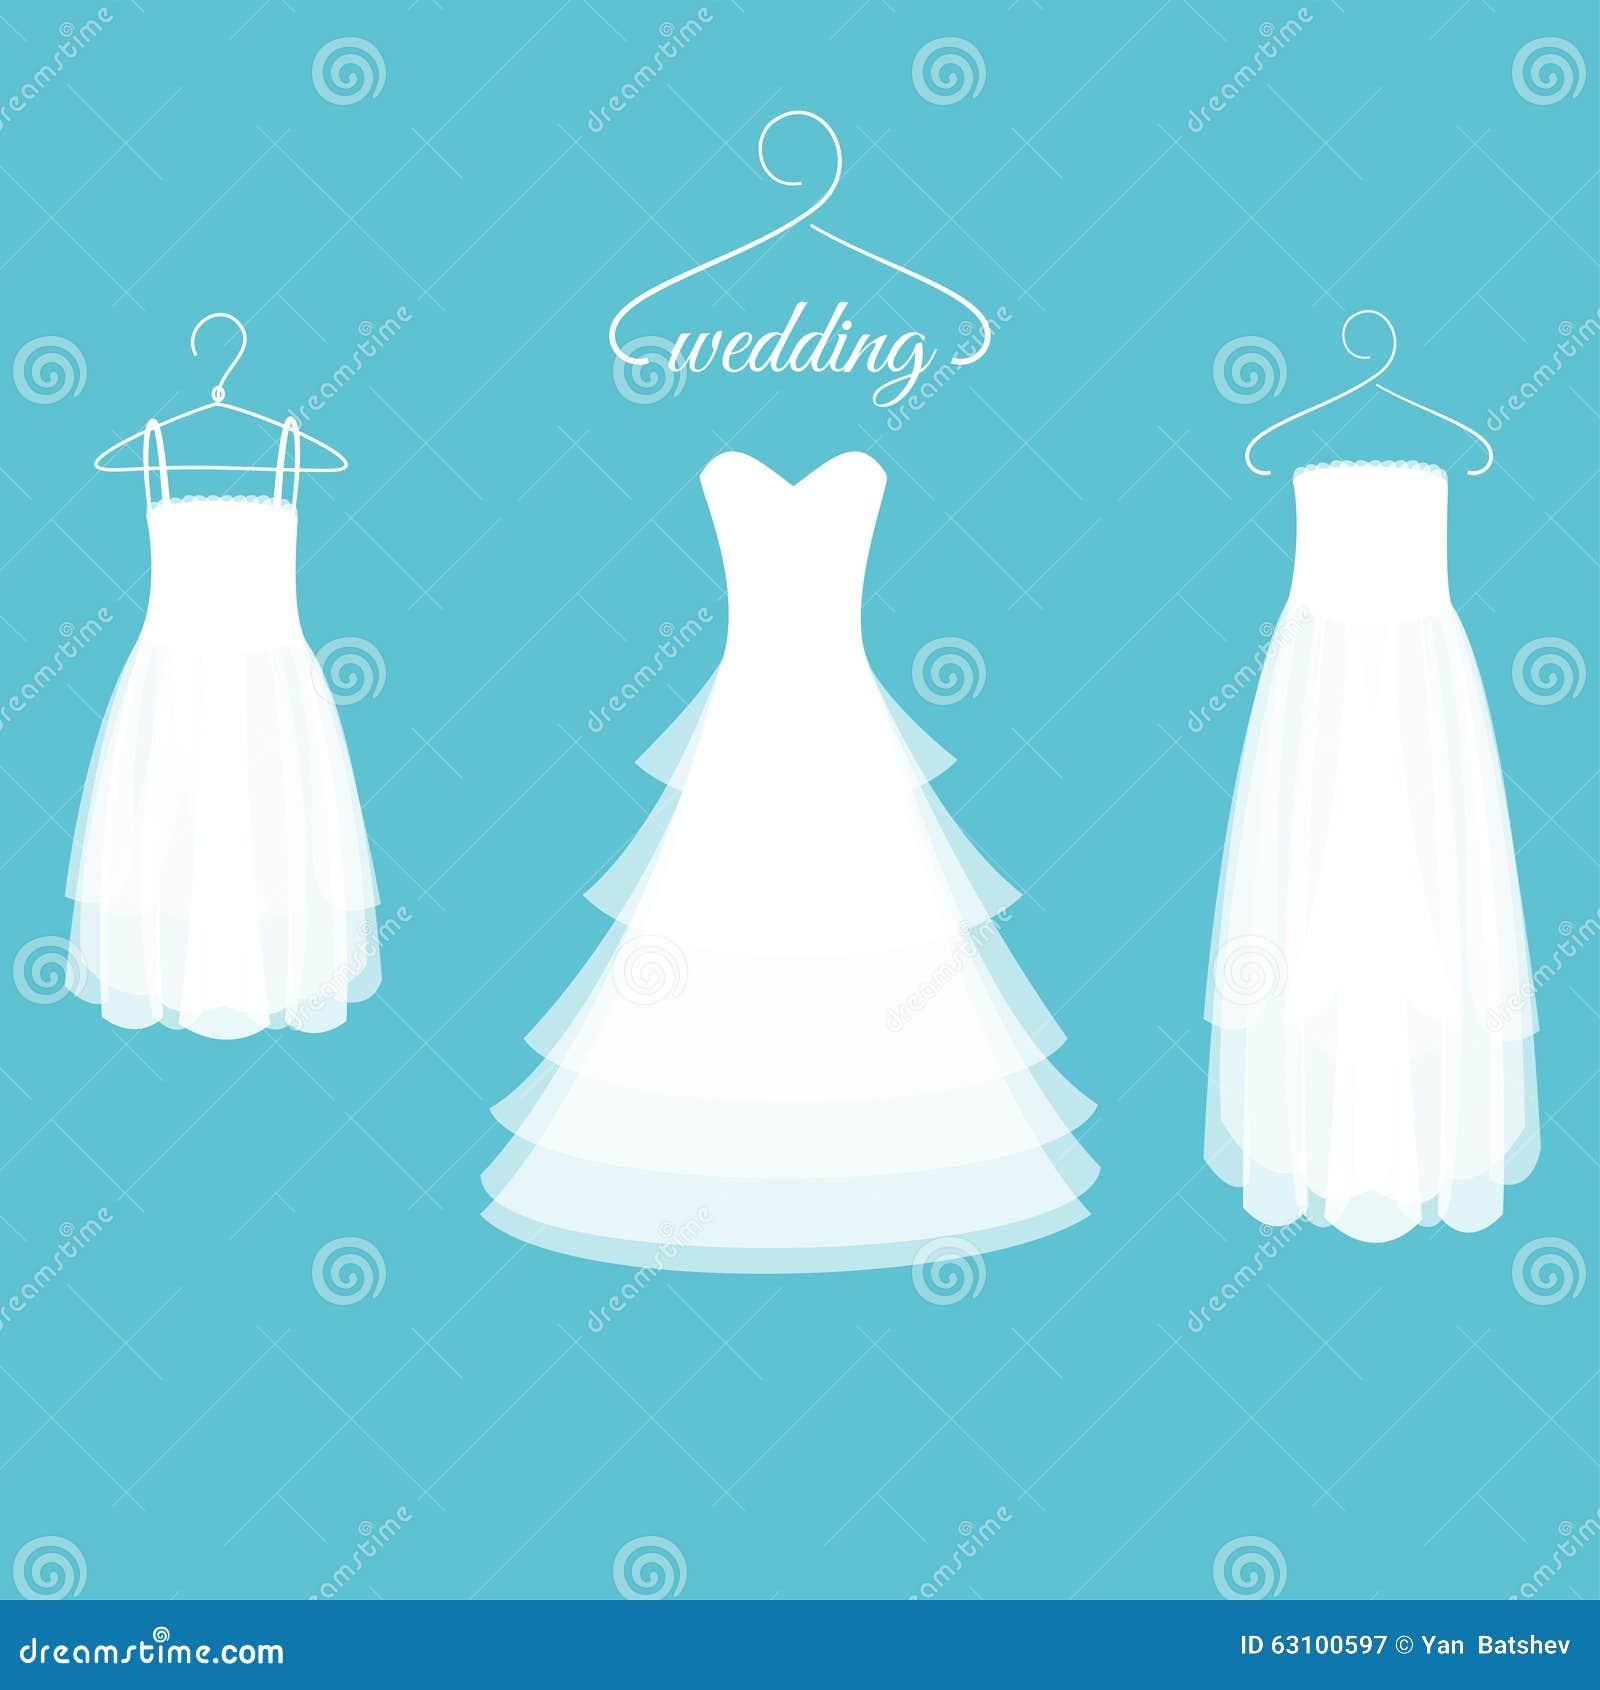 Wedding Dresses on Hangers stock vector. Illustration of element ...